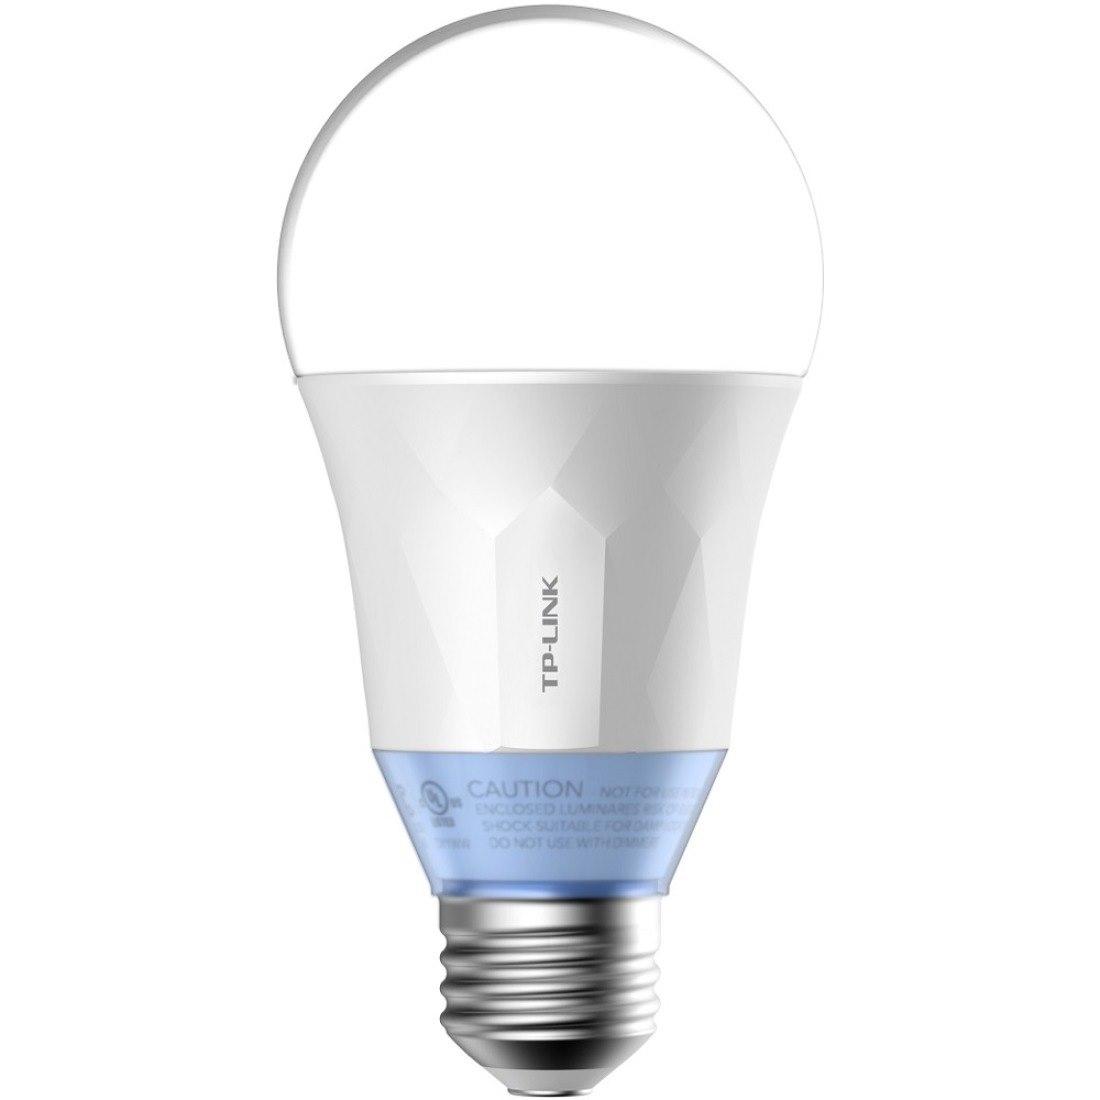 TP-LINK LED Light Bulb